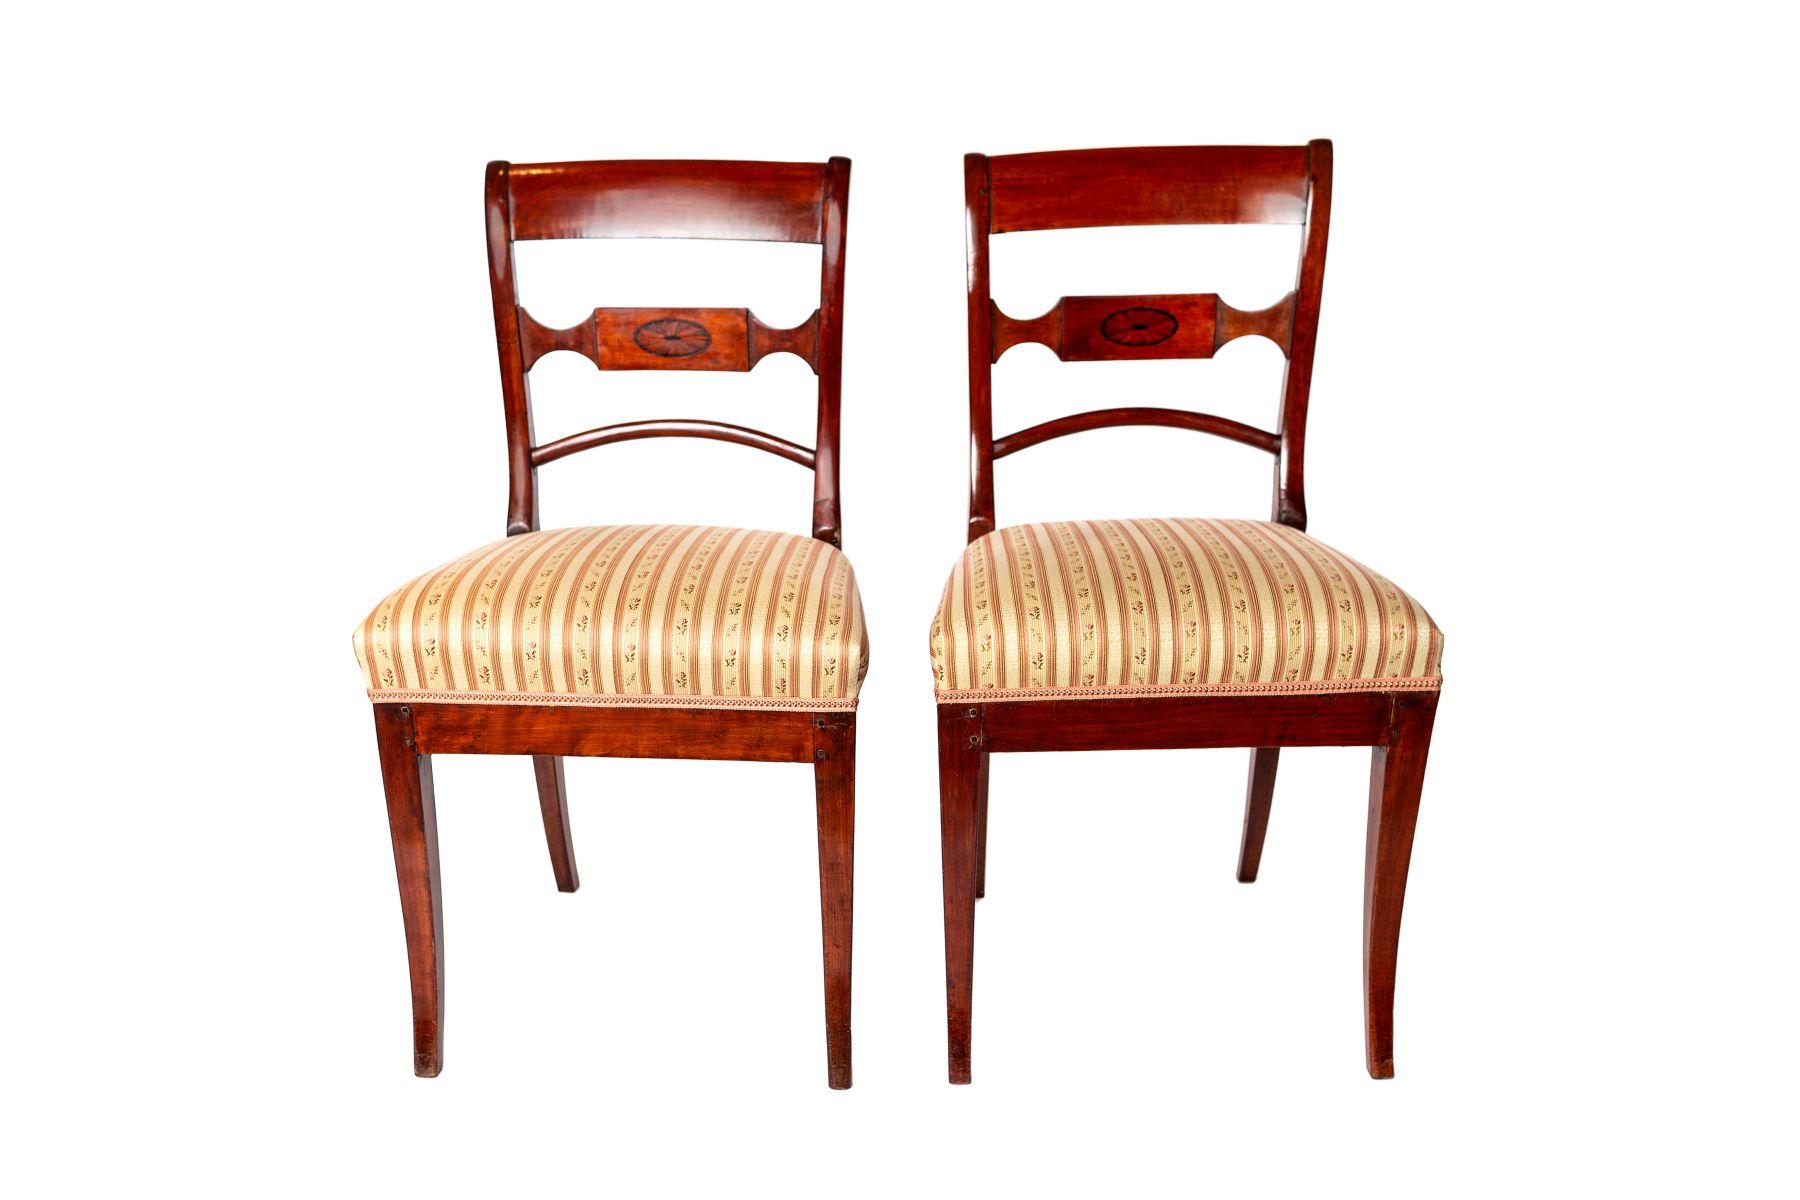 #58 Two Biedermeier chairs | Biedermeierstühle Image